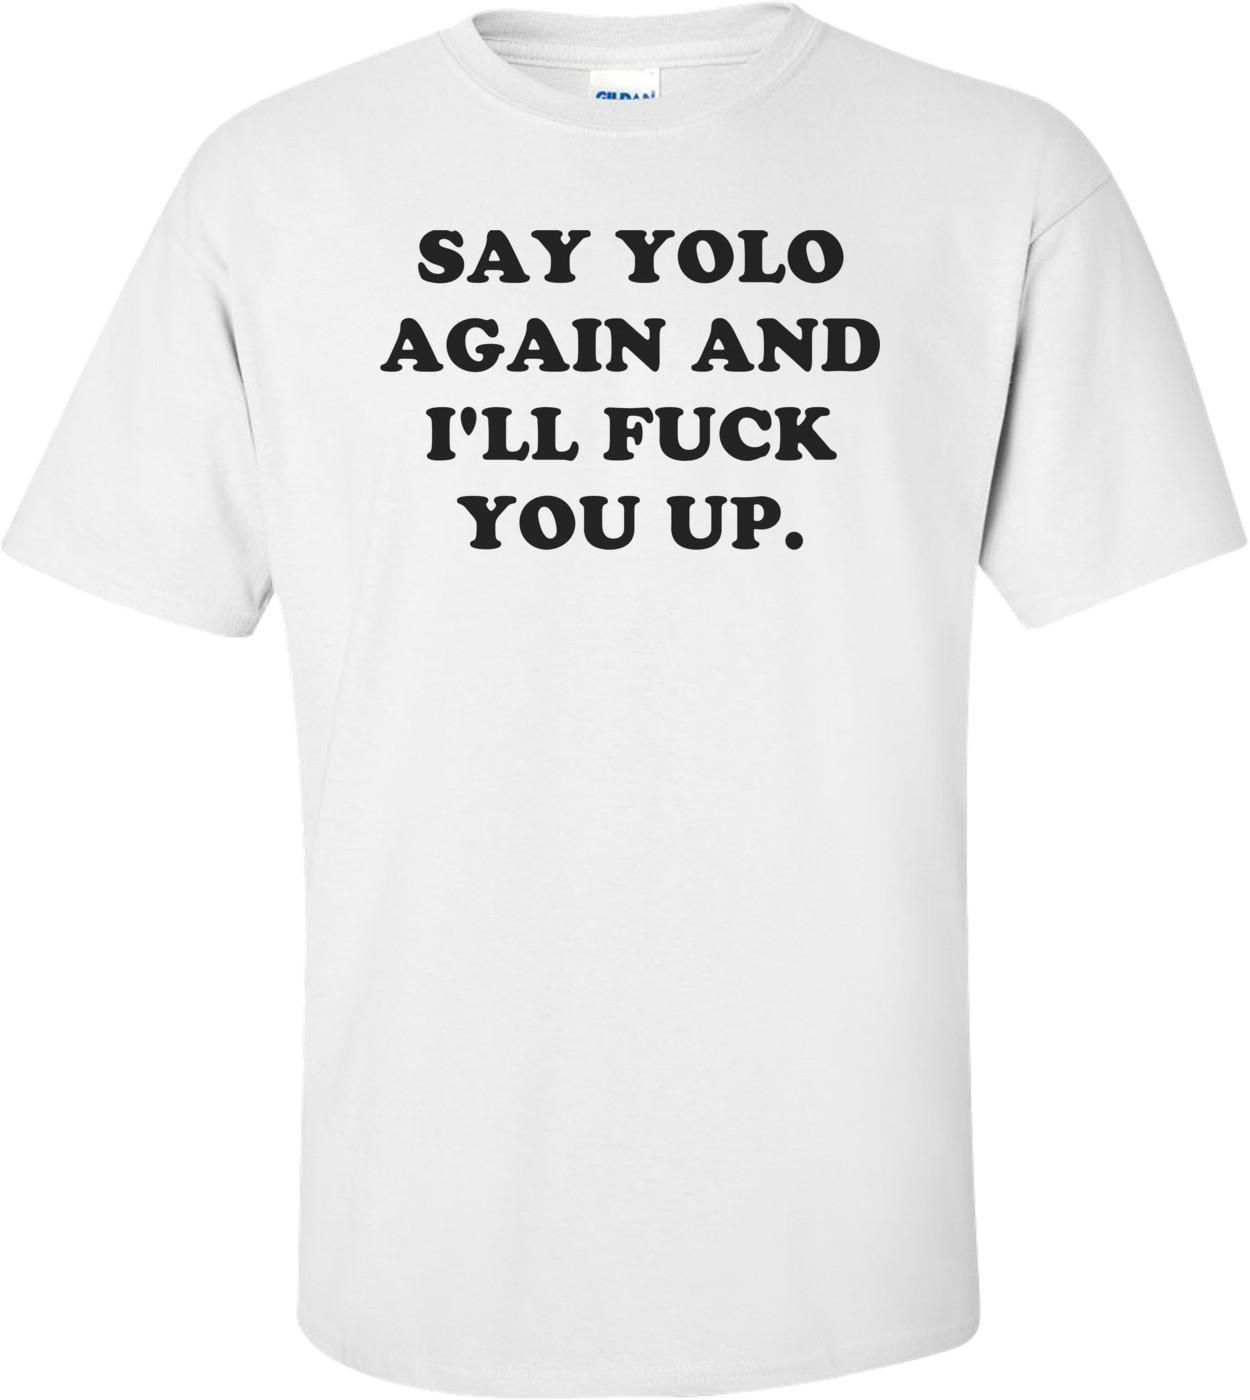 SAY YOLO AGAIN AND I'LL FUCK YOU UP. Shirt